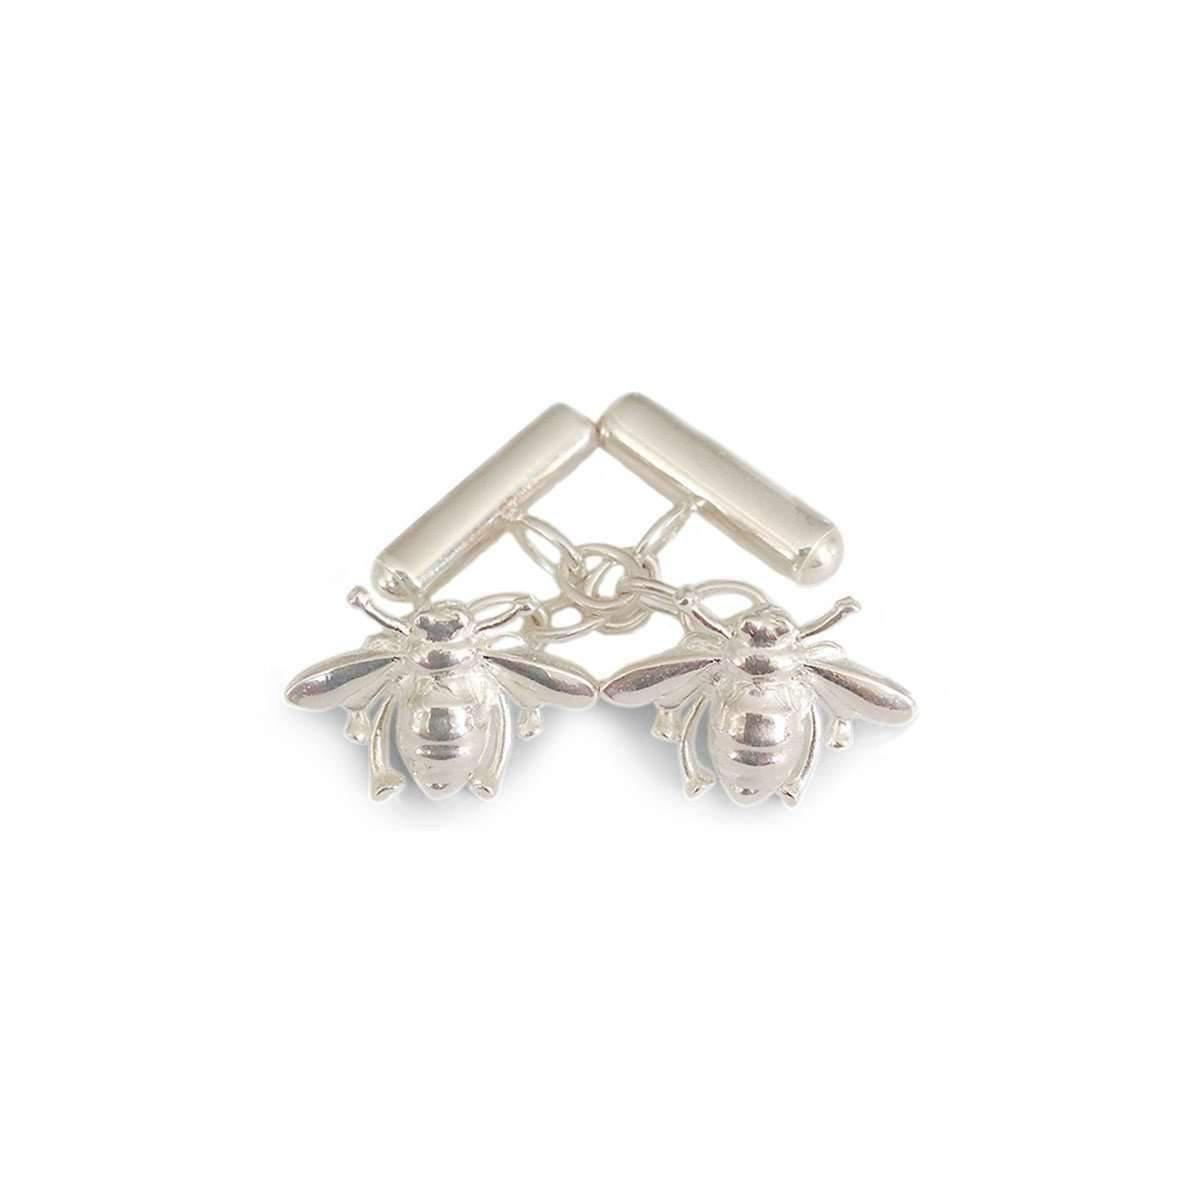 Deborah Blyth Jewellery Sterling Silver Bee Stud Earrings FeZfOUMUj0